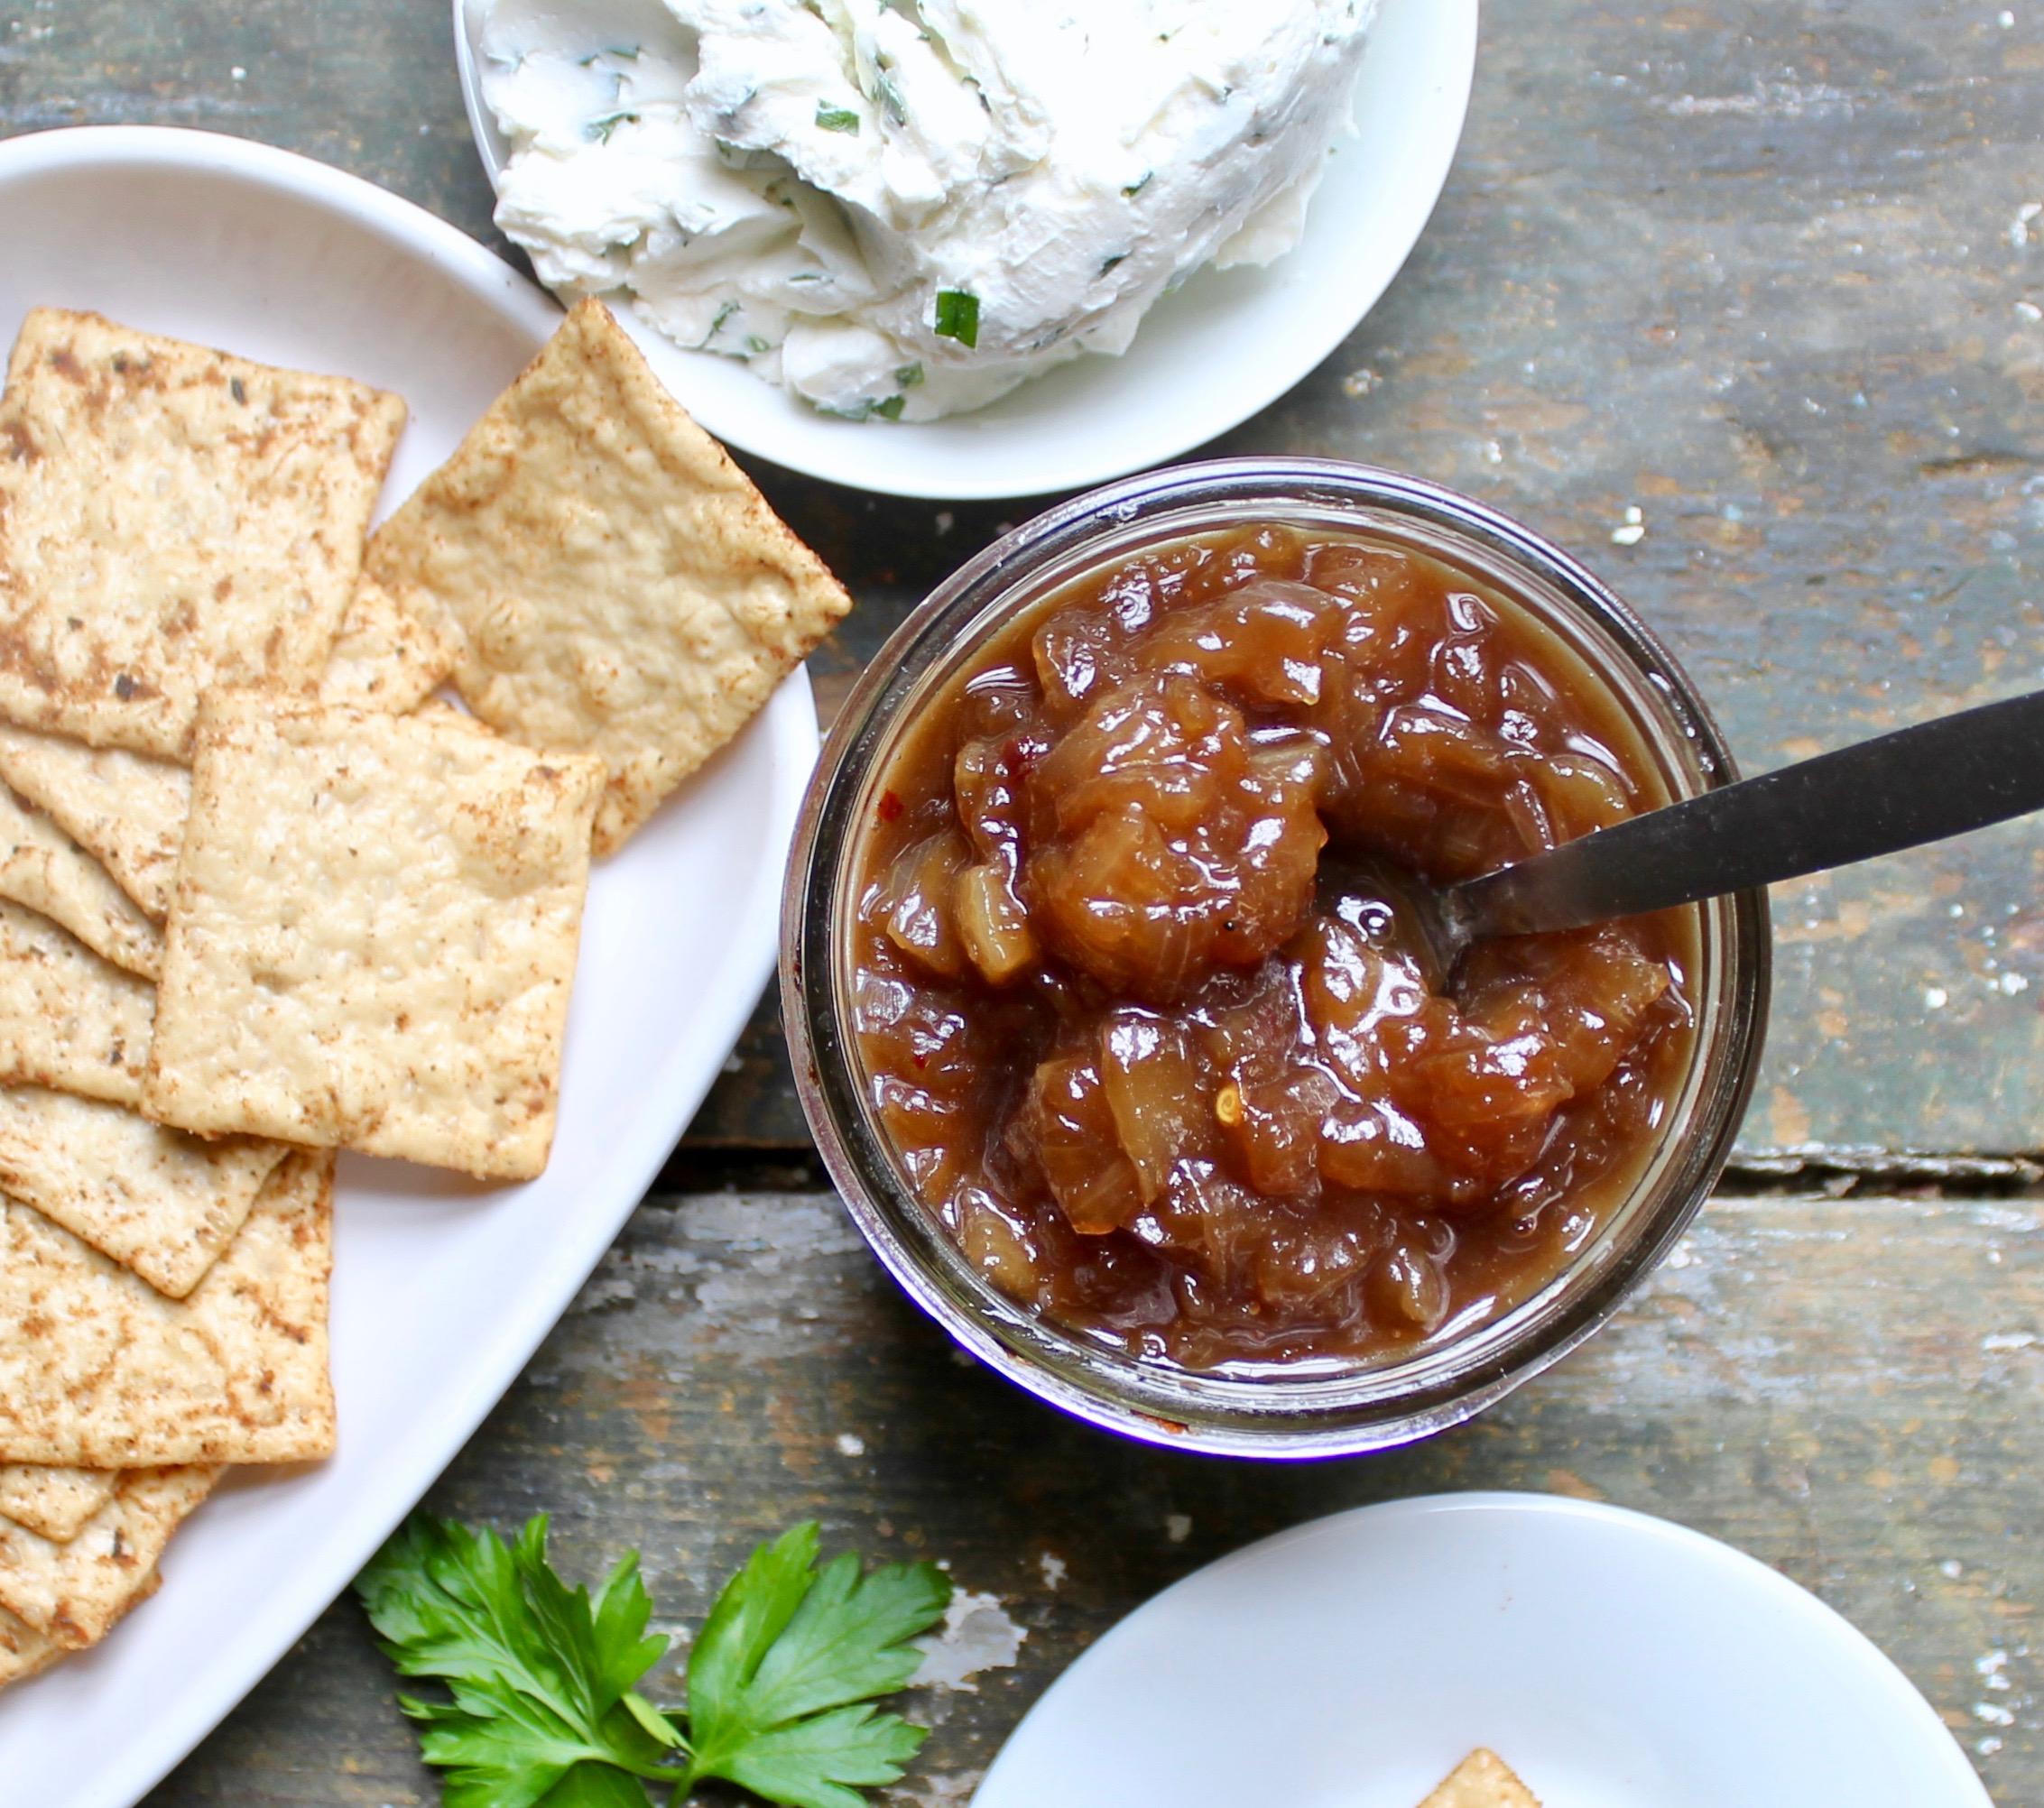 jar of vidalia onion chutney